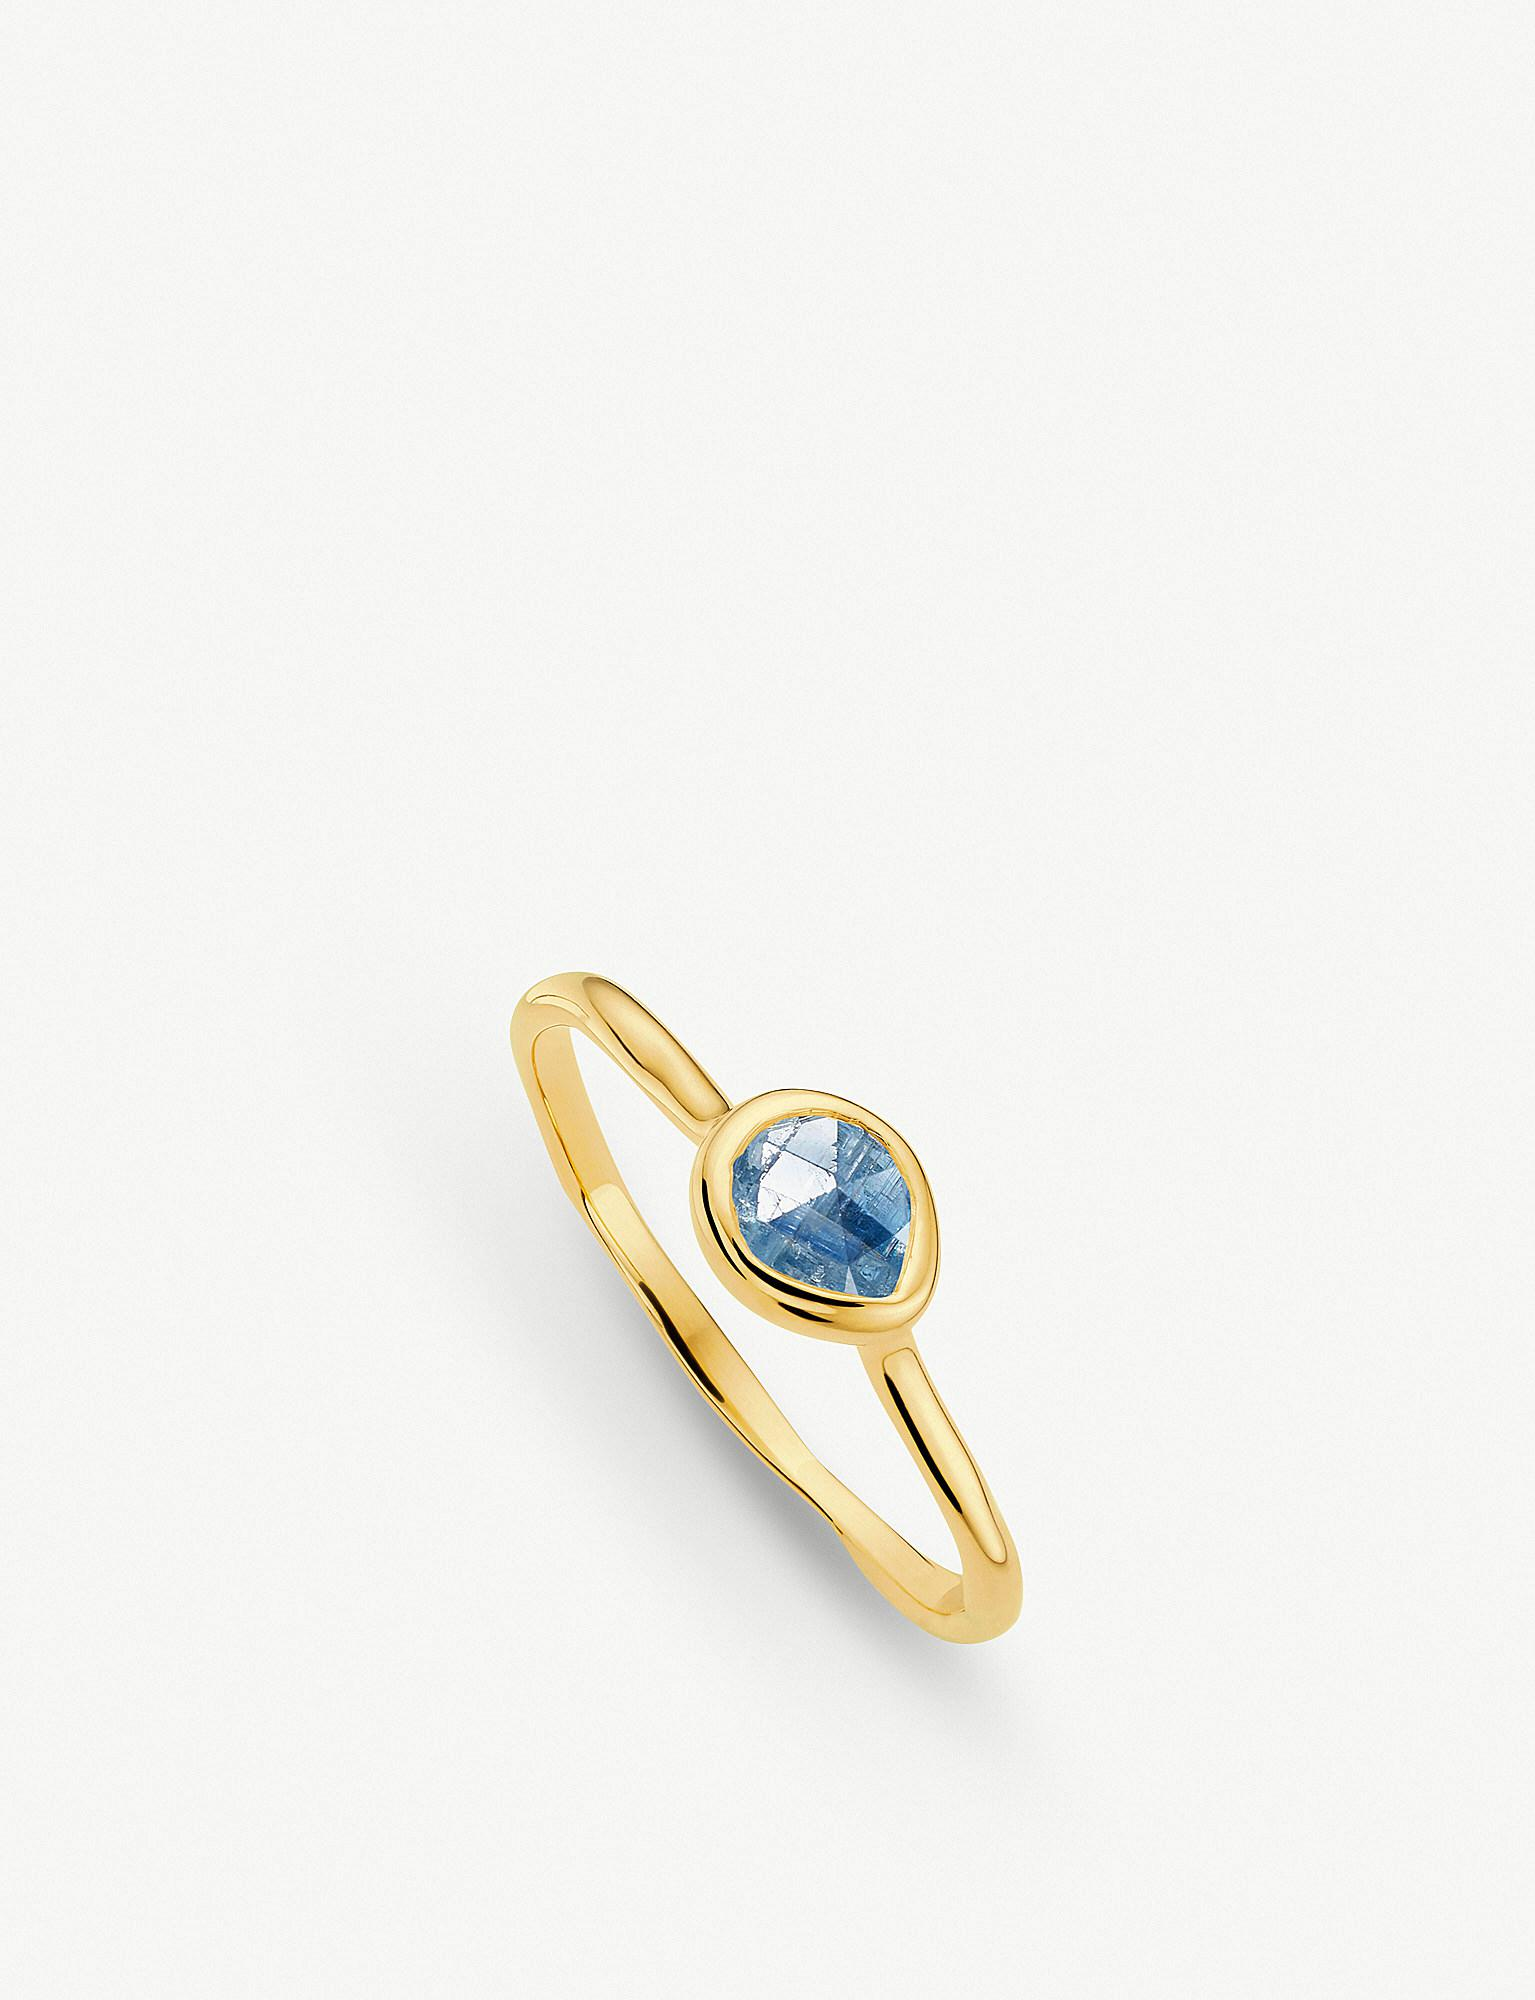 Sterling Silver Siren Small Stacking Ring Kyanite Monica Vinader z2KHoeE